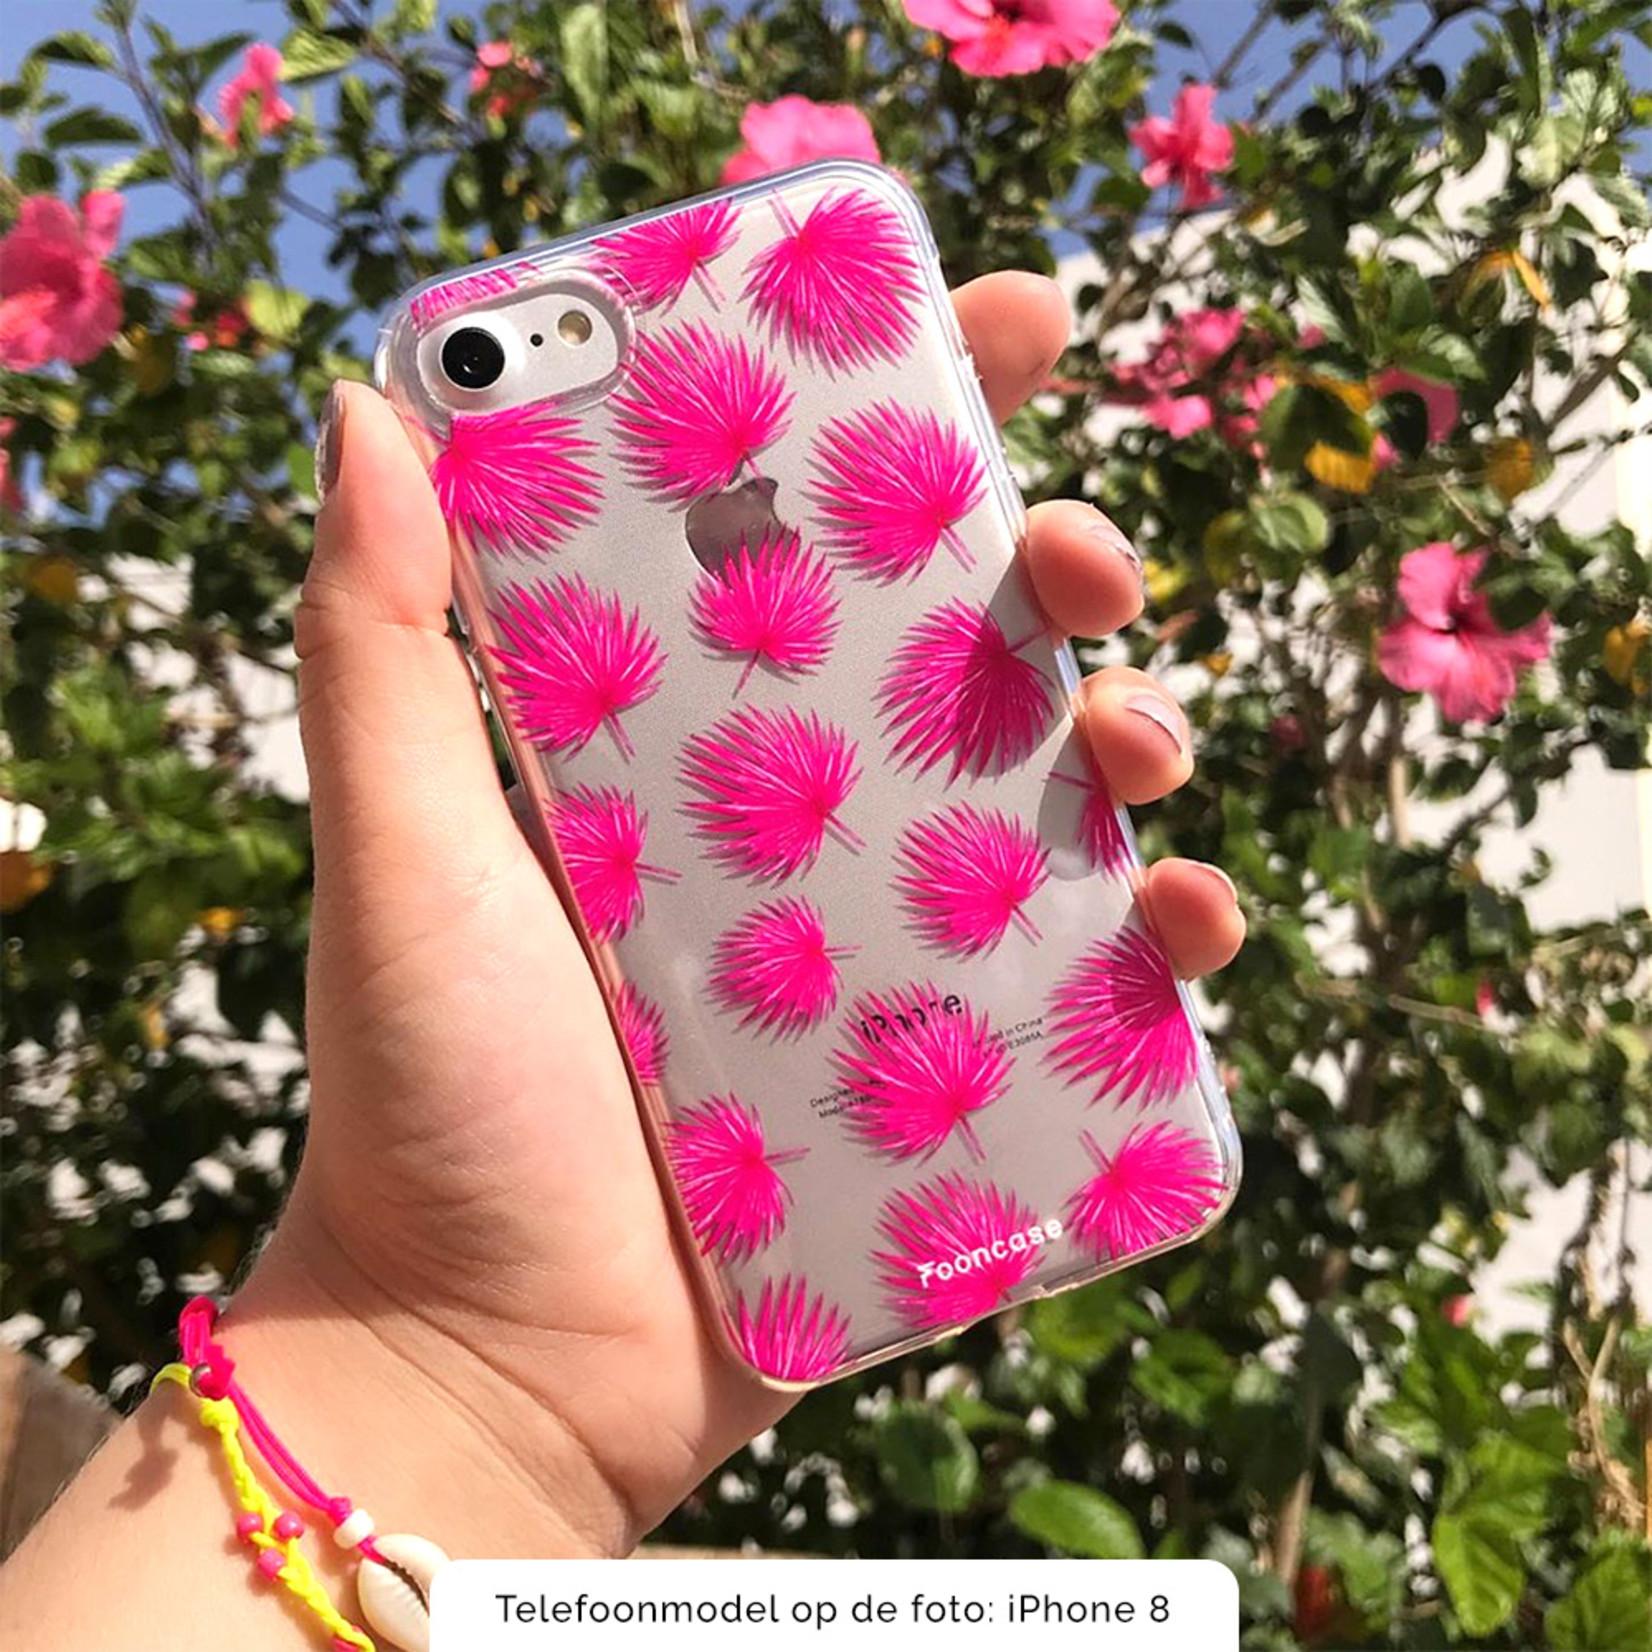 FOONCASE Samsung Galaxy A5 2016 Handyhülle - Rosa Blätter